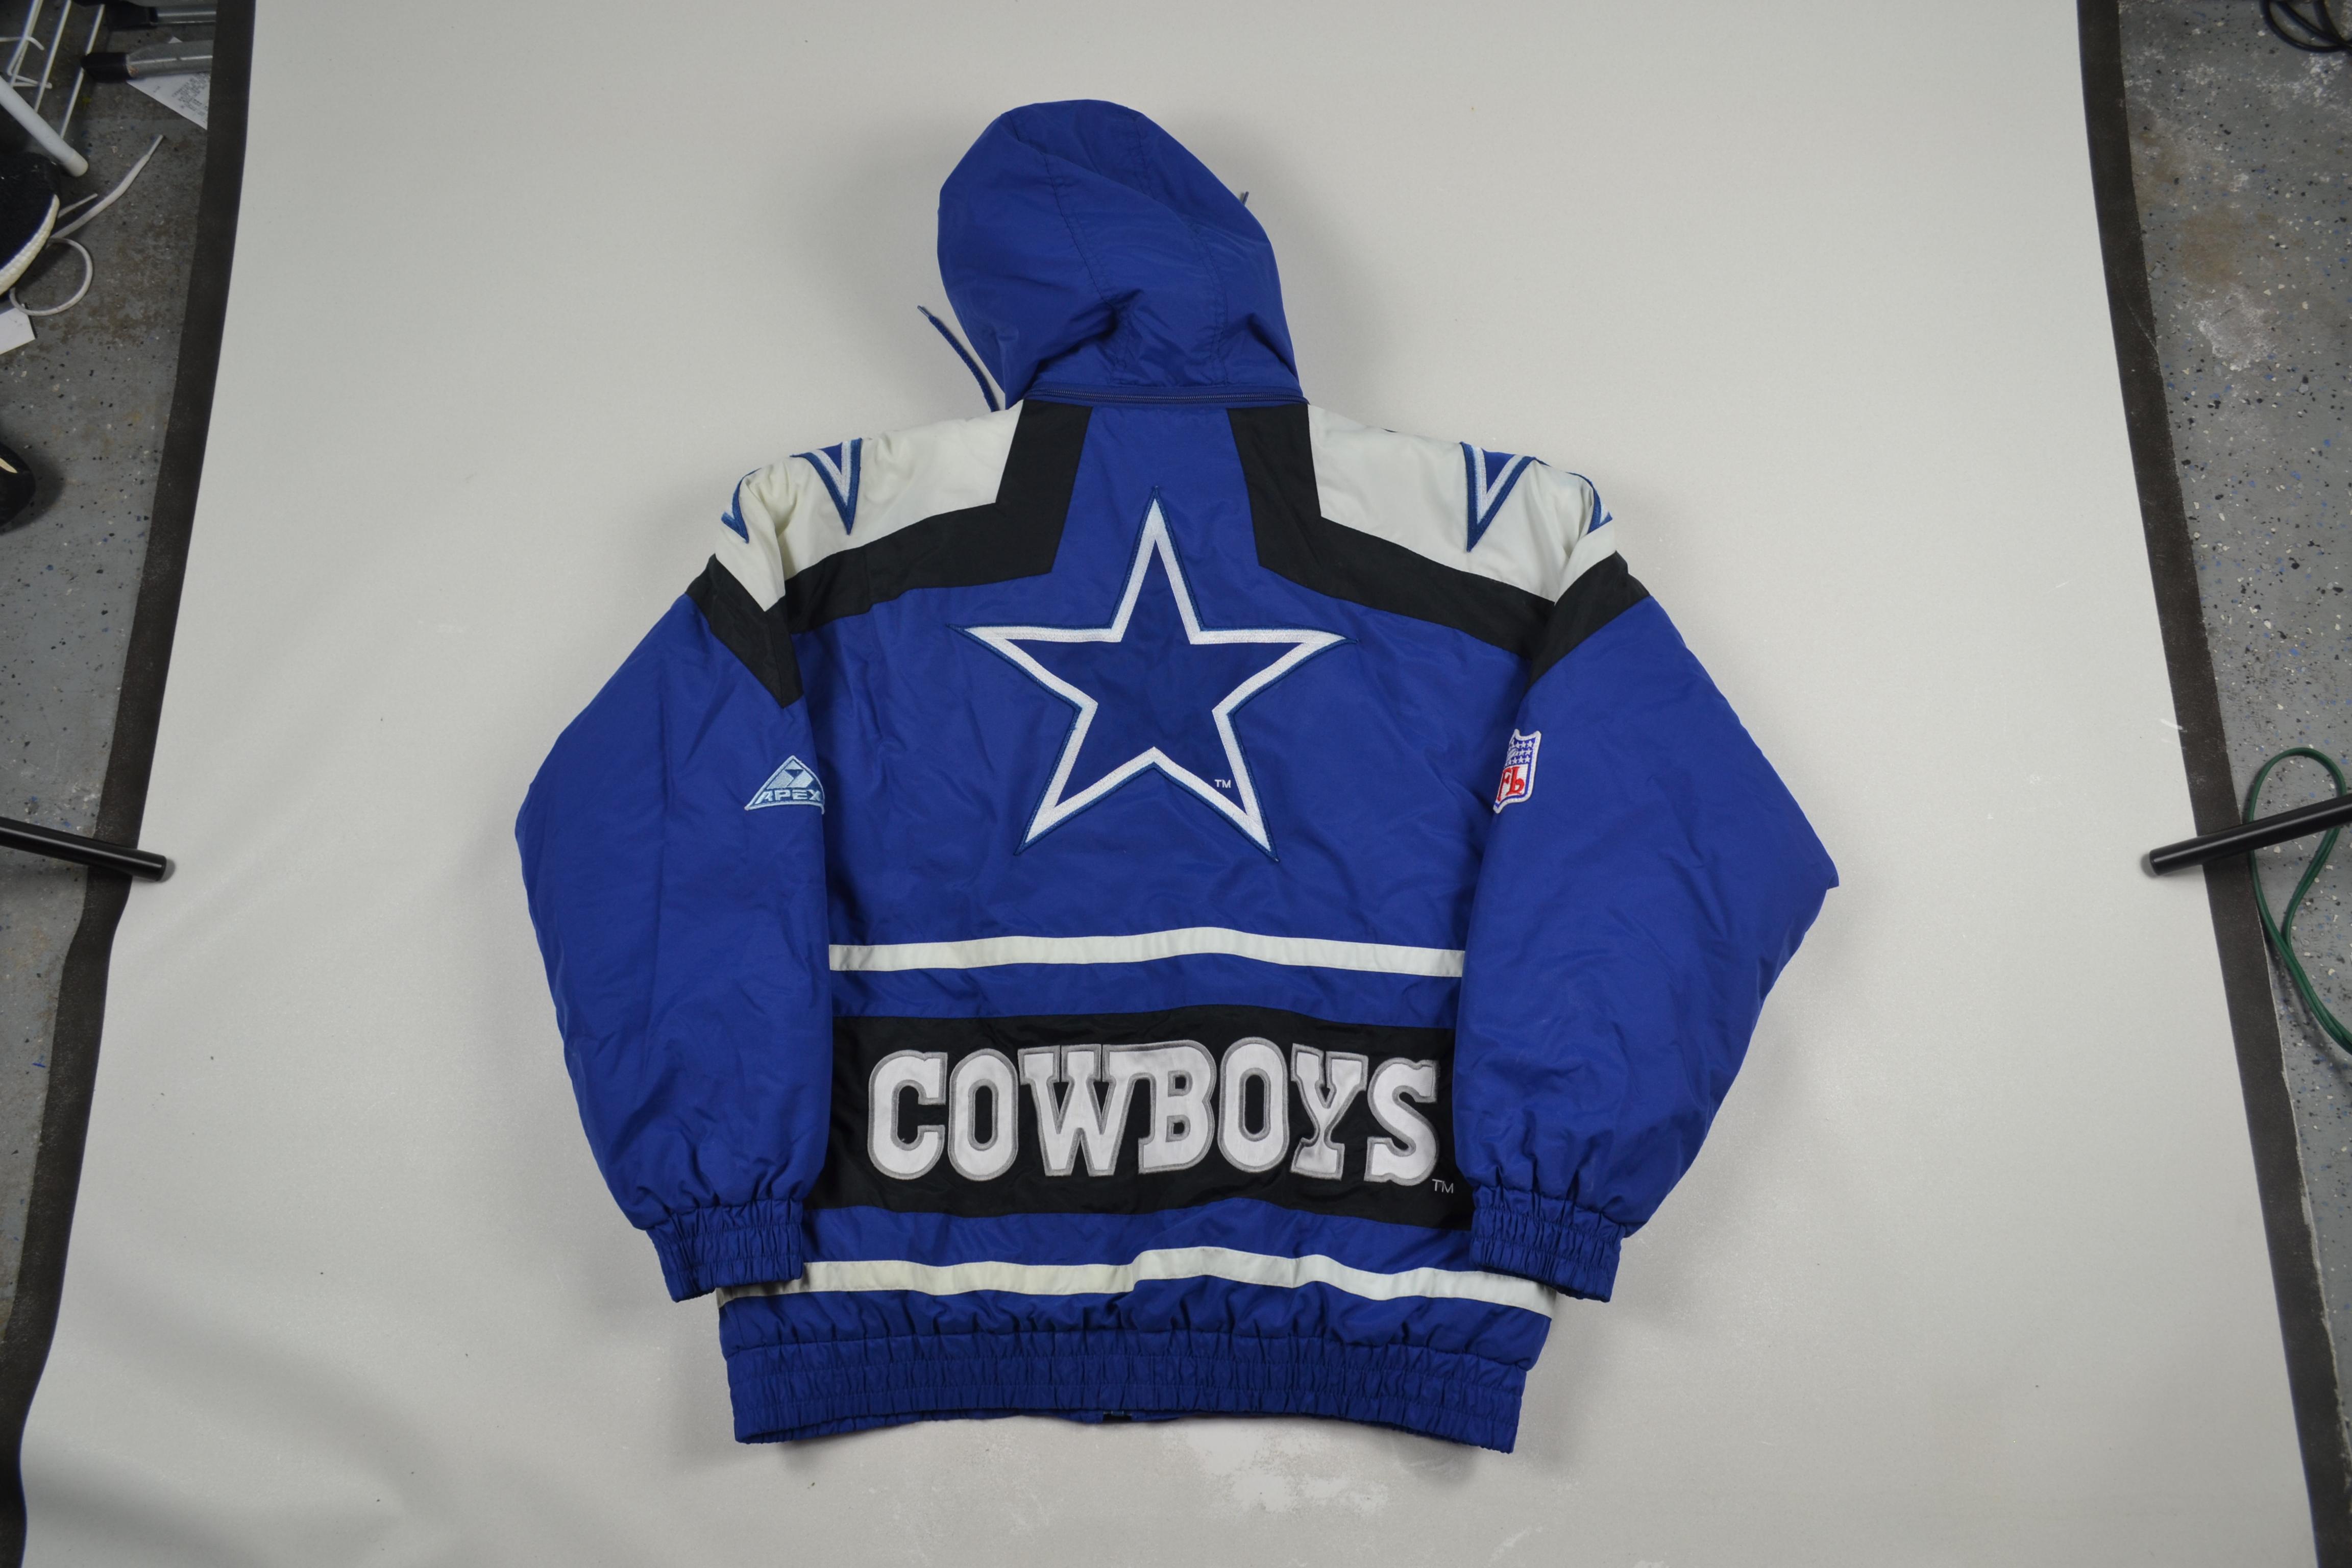 new concept 058d5 a53fa VTG 90s Dallas Cowboys Apex Windbreaker Jacket Coat Sweater NFL Football  80s 90s streetwear fashion hip hop